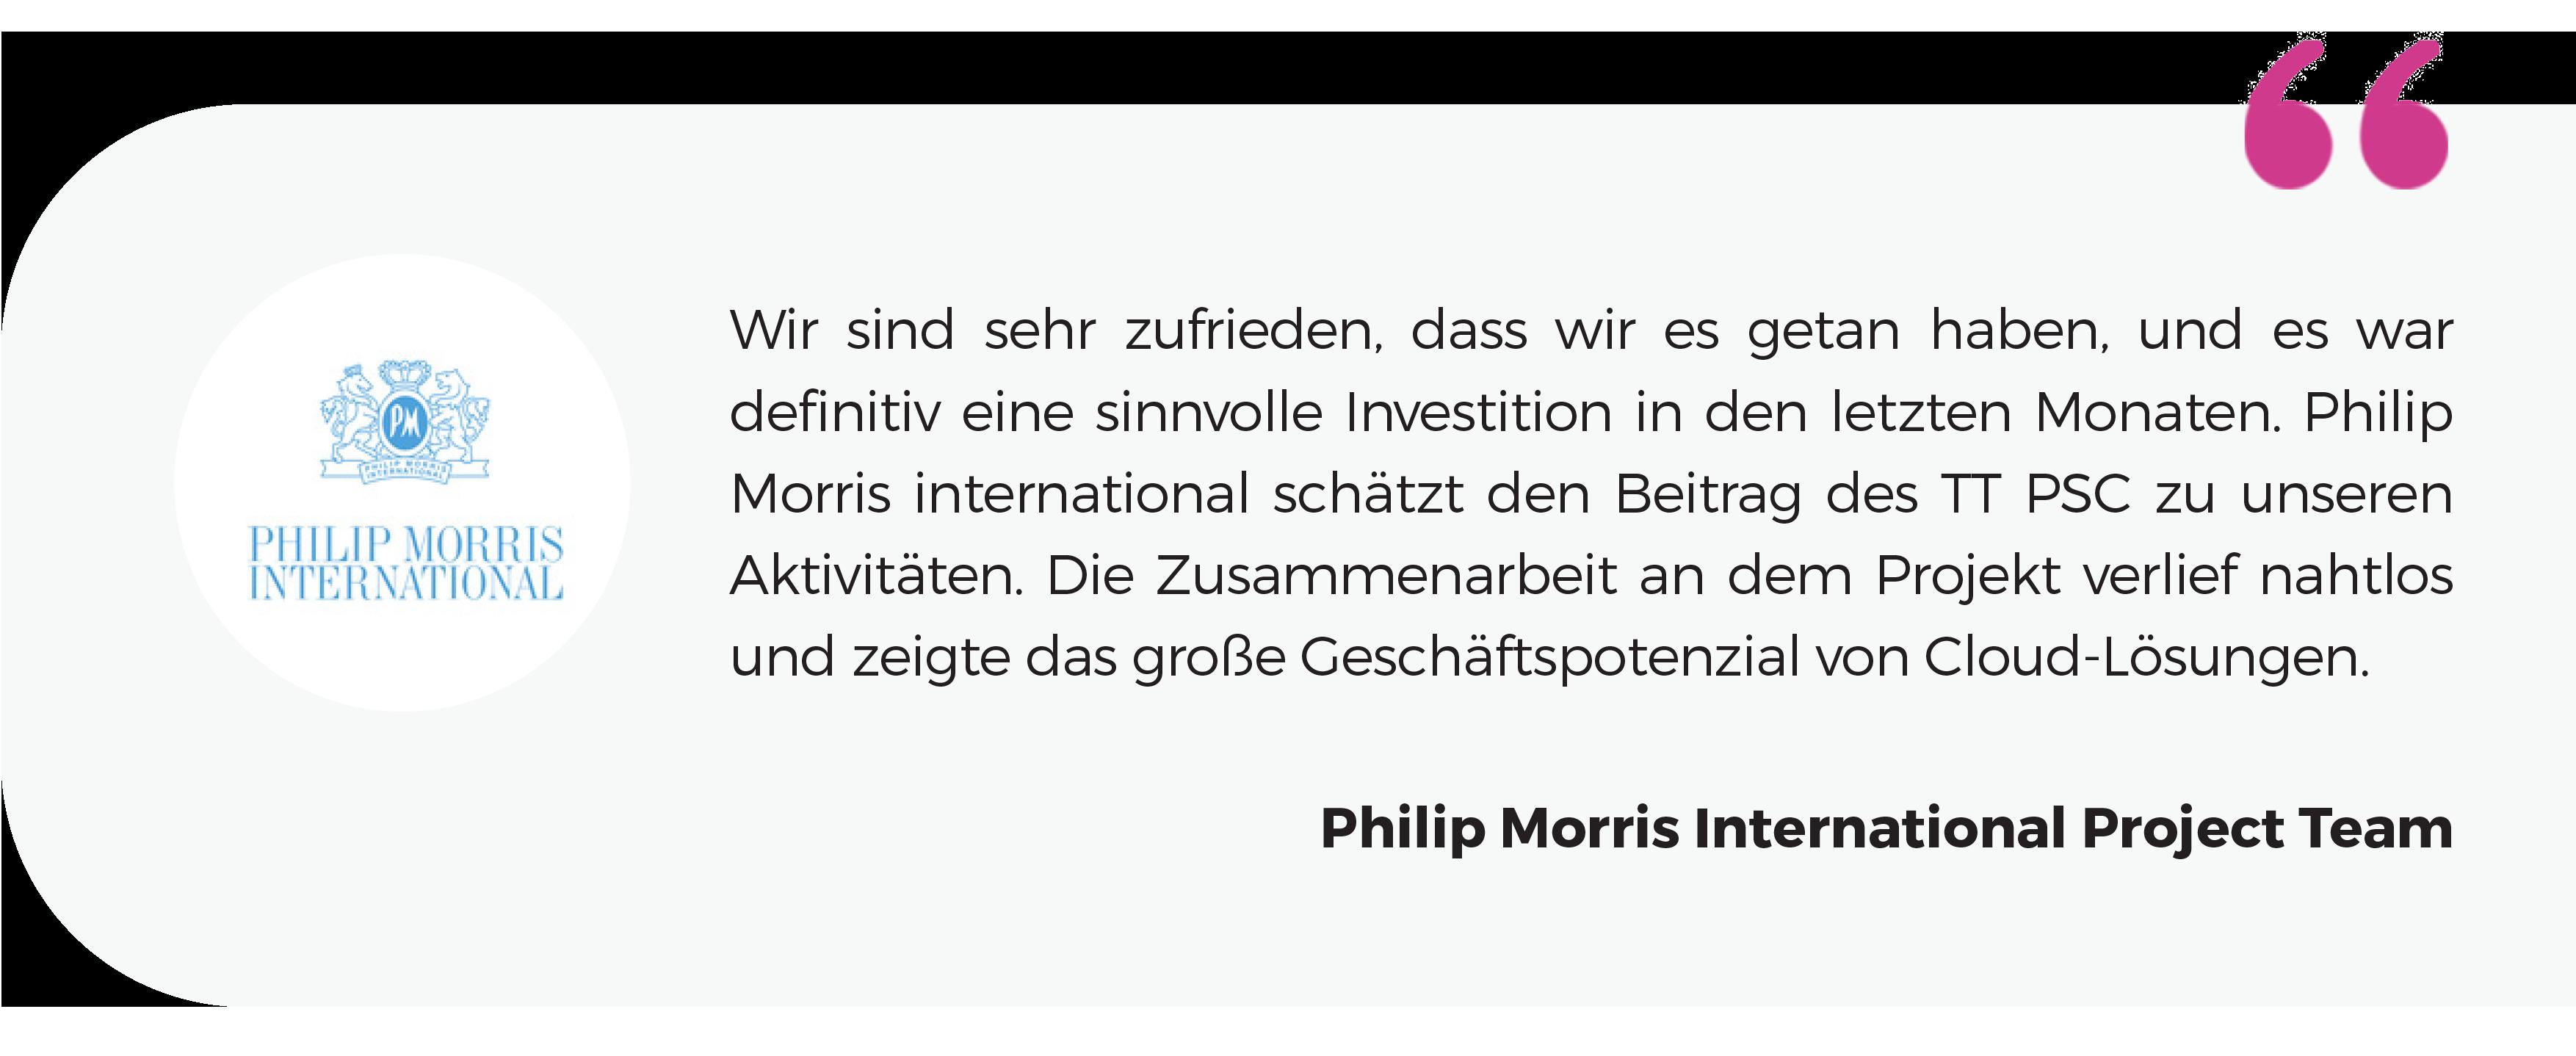 Knowledge_Management_System_Rapid_PoV_for_Phillip_Morris_International